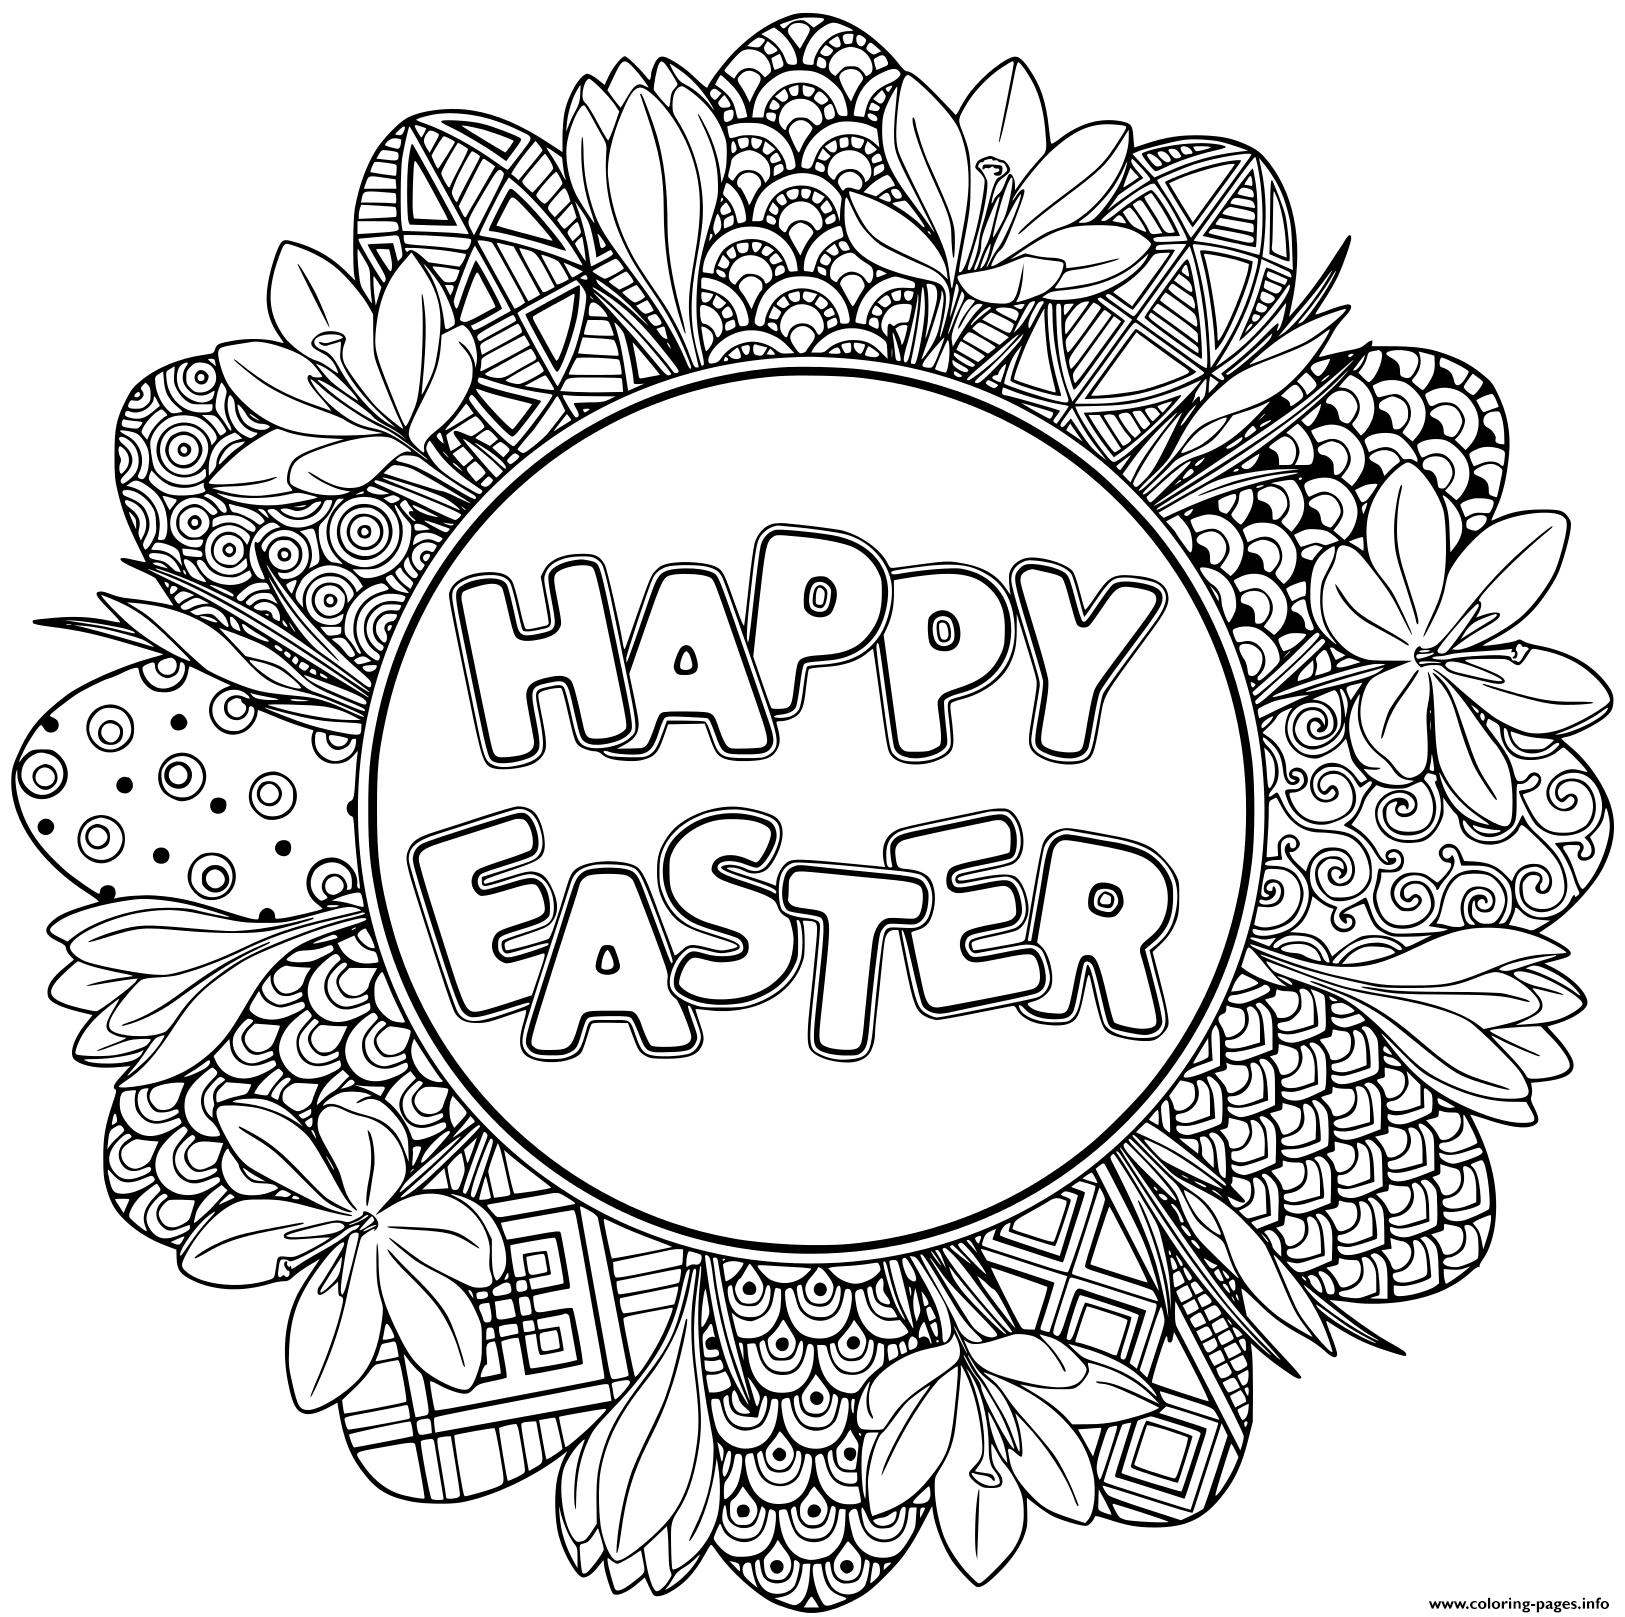 Happy Easter Easter Mandala Coloring